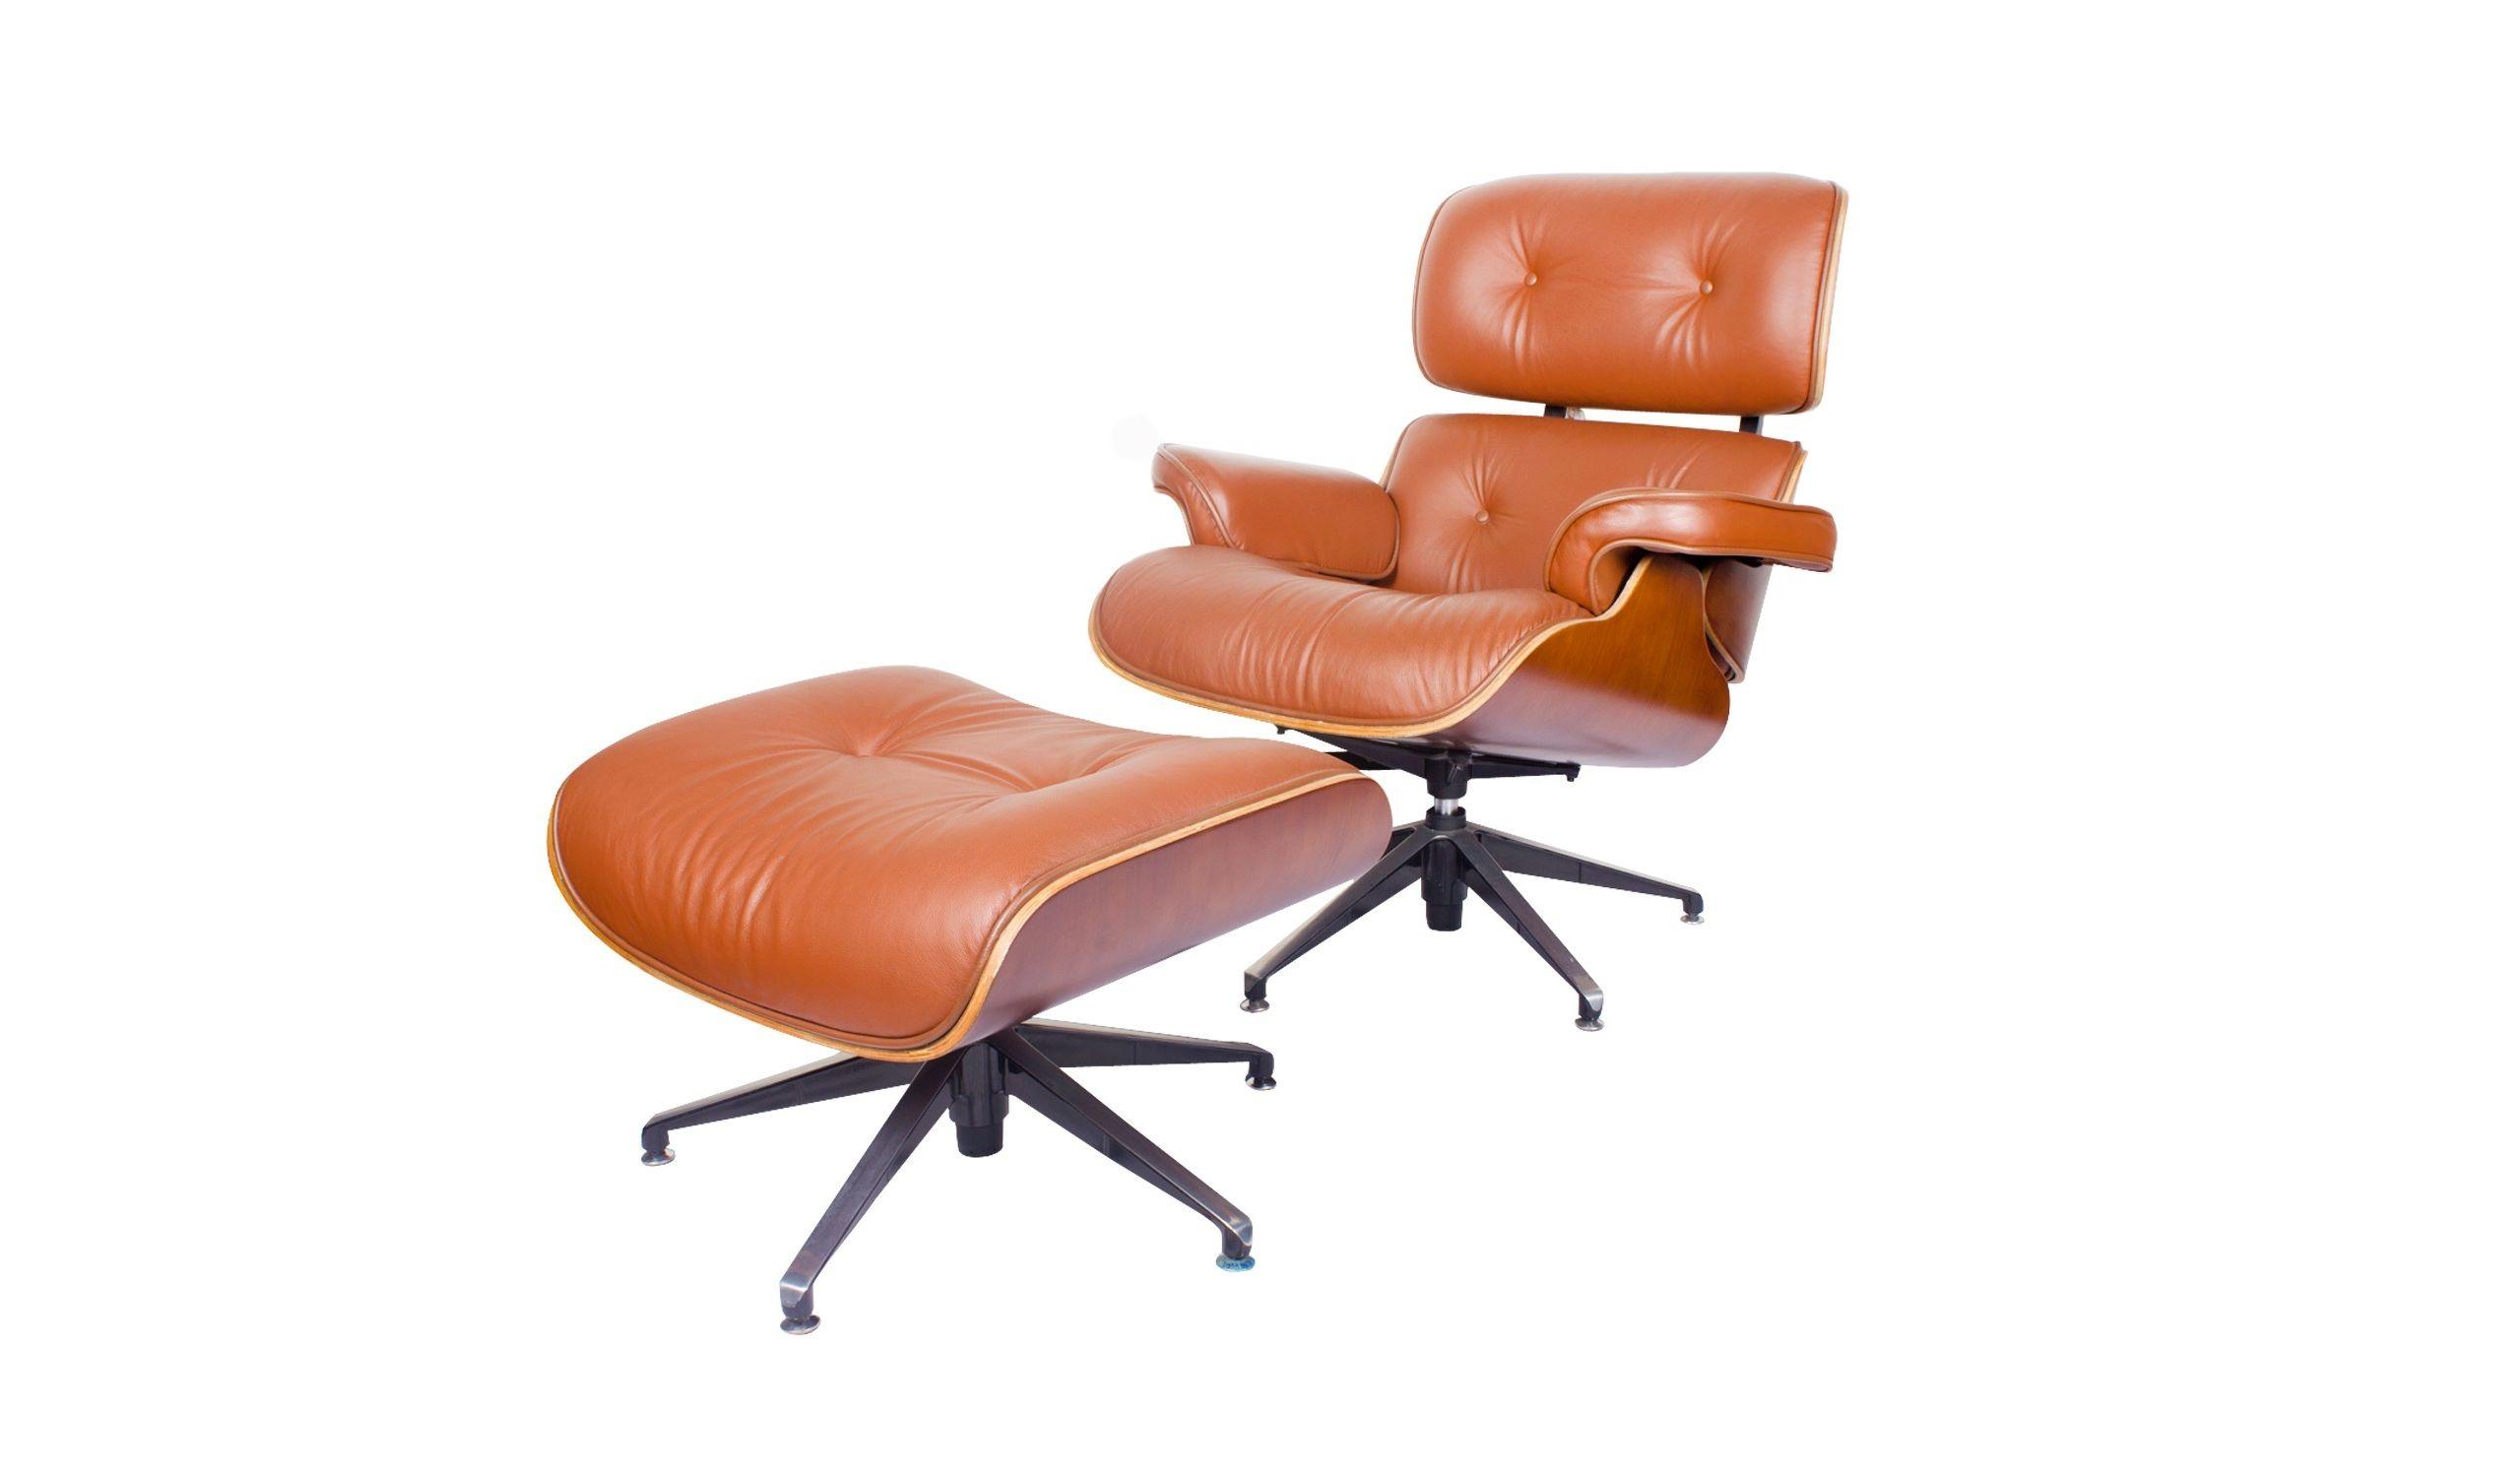 buy office furniture online from boss s cabin offering a wide range